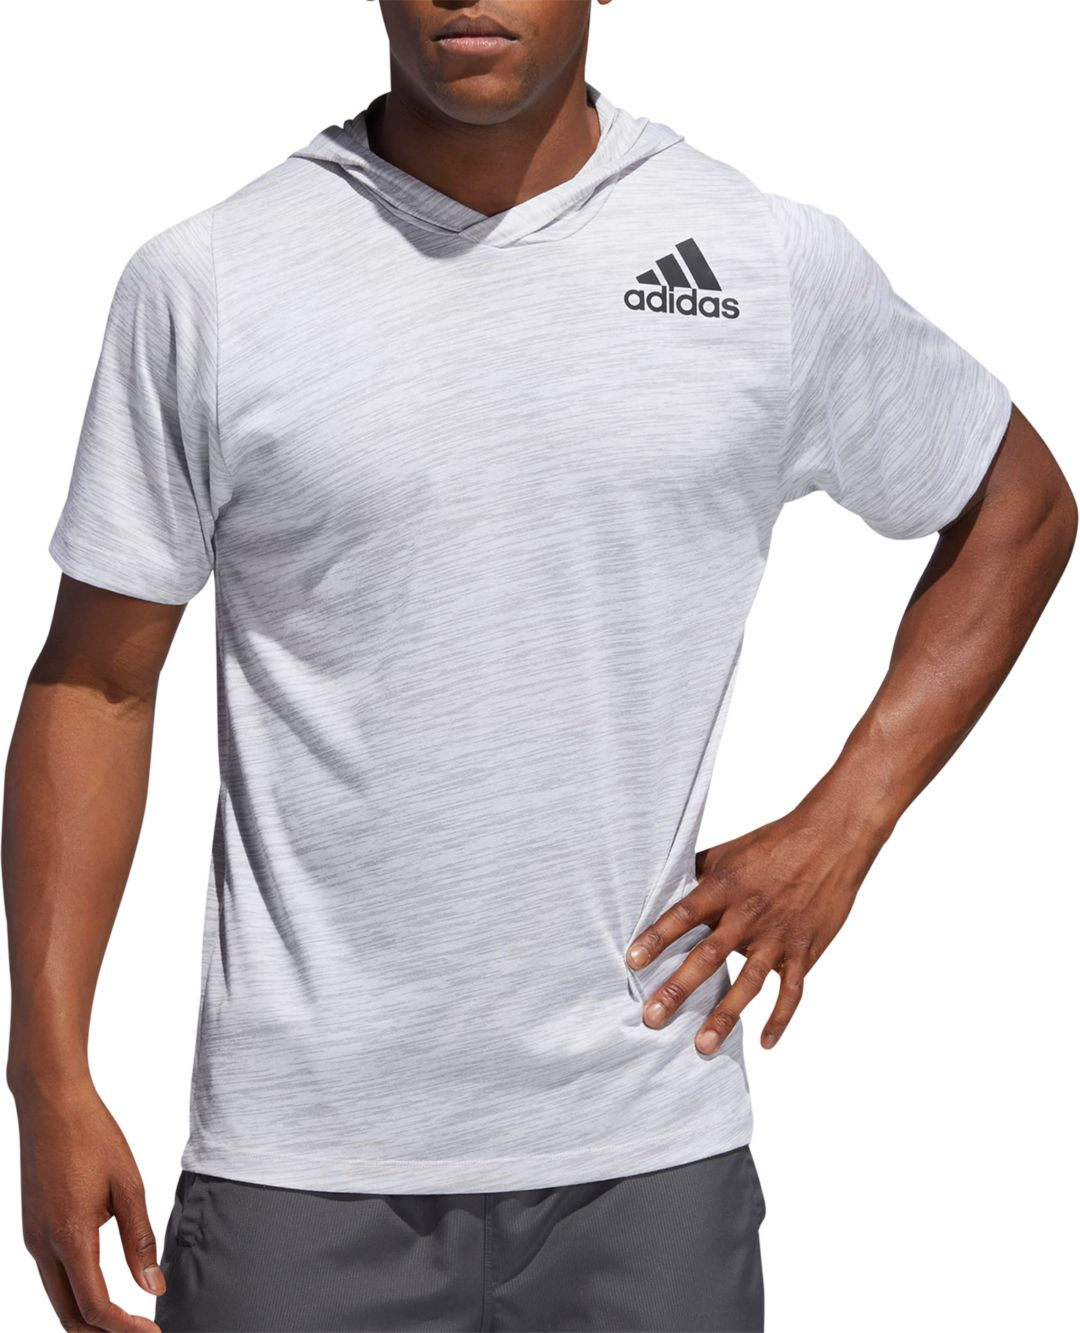 5d47f1ecfa adidas Men's Three Stripe Life FreeLift All-American Short Sleeve Hoodie